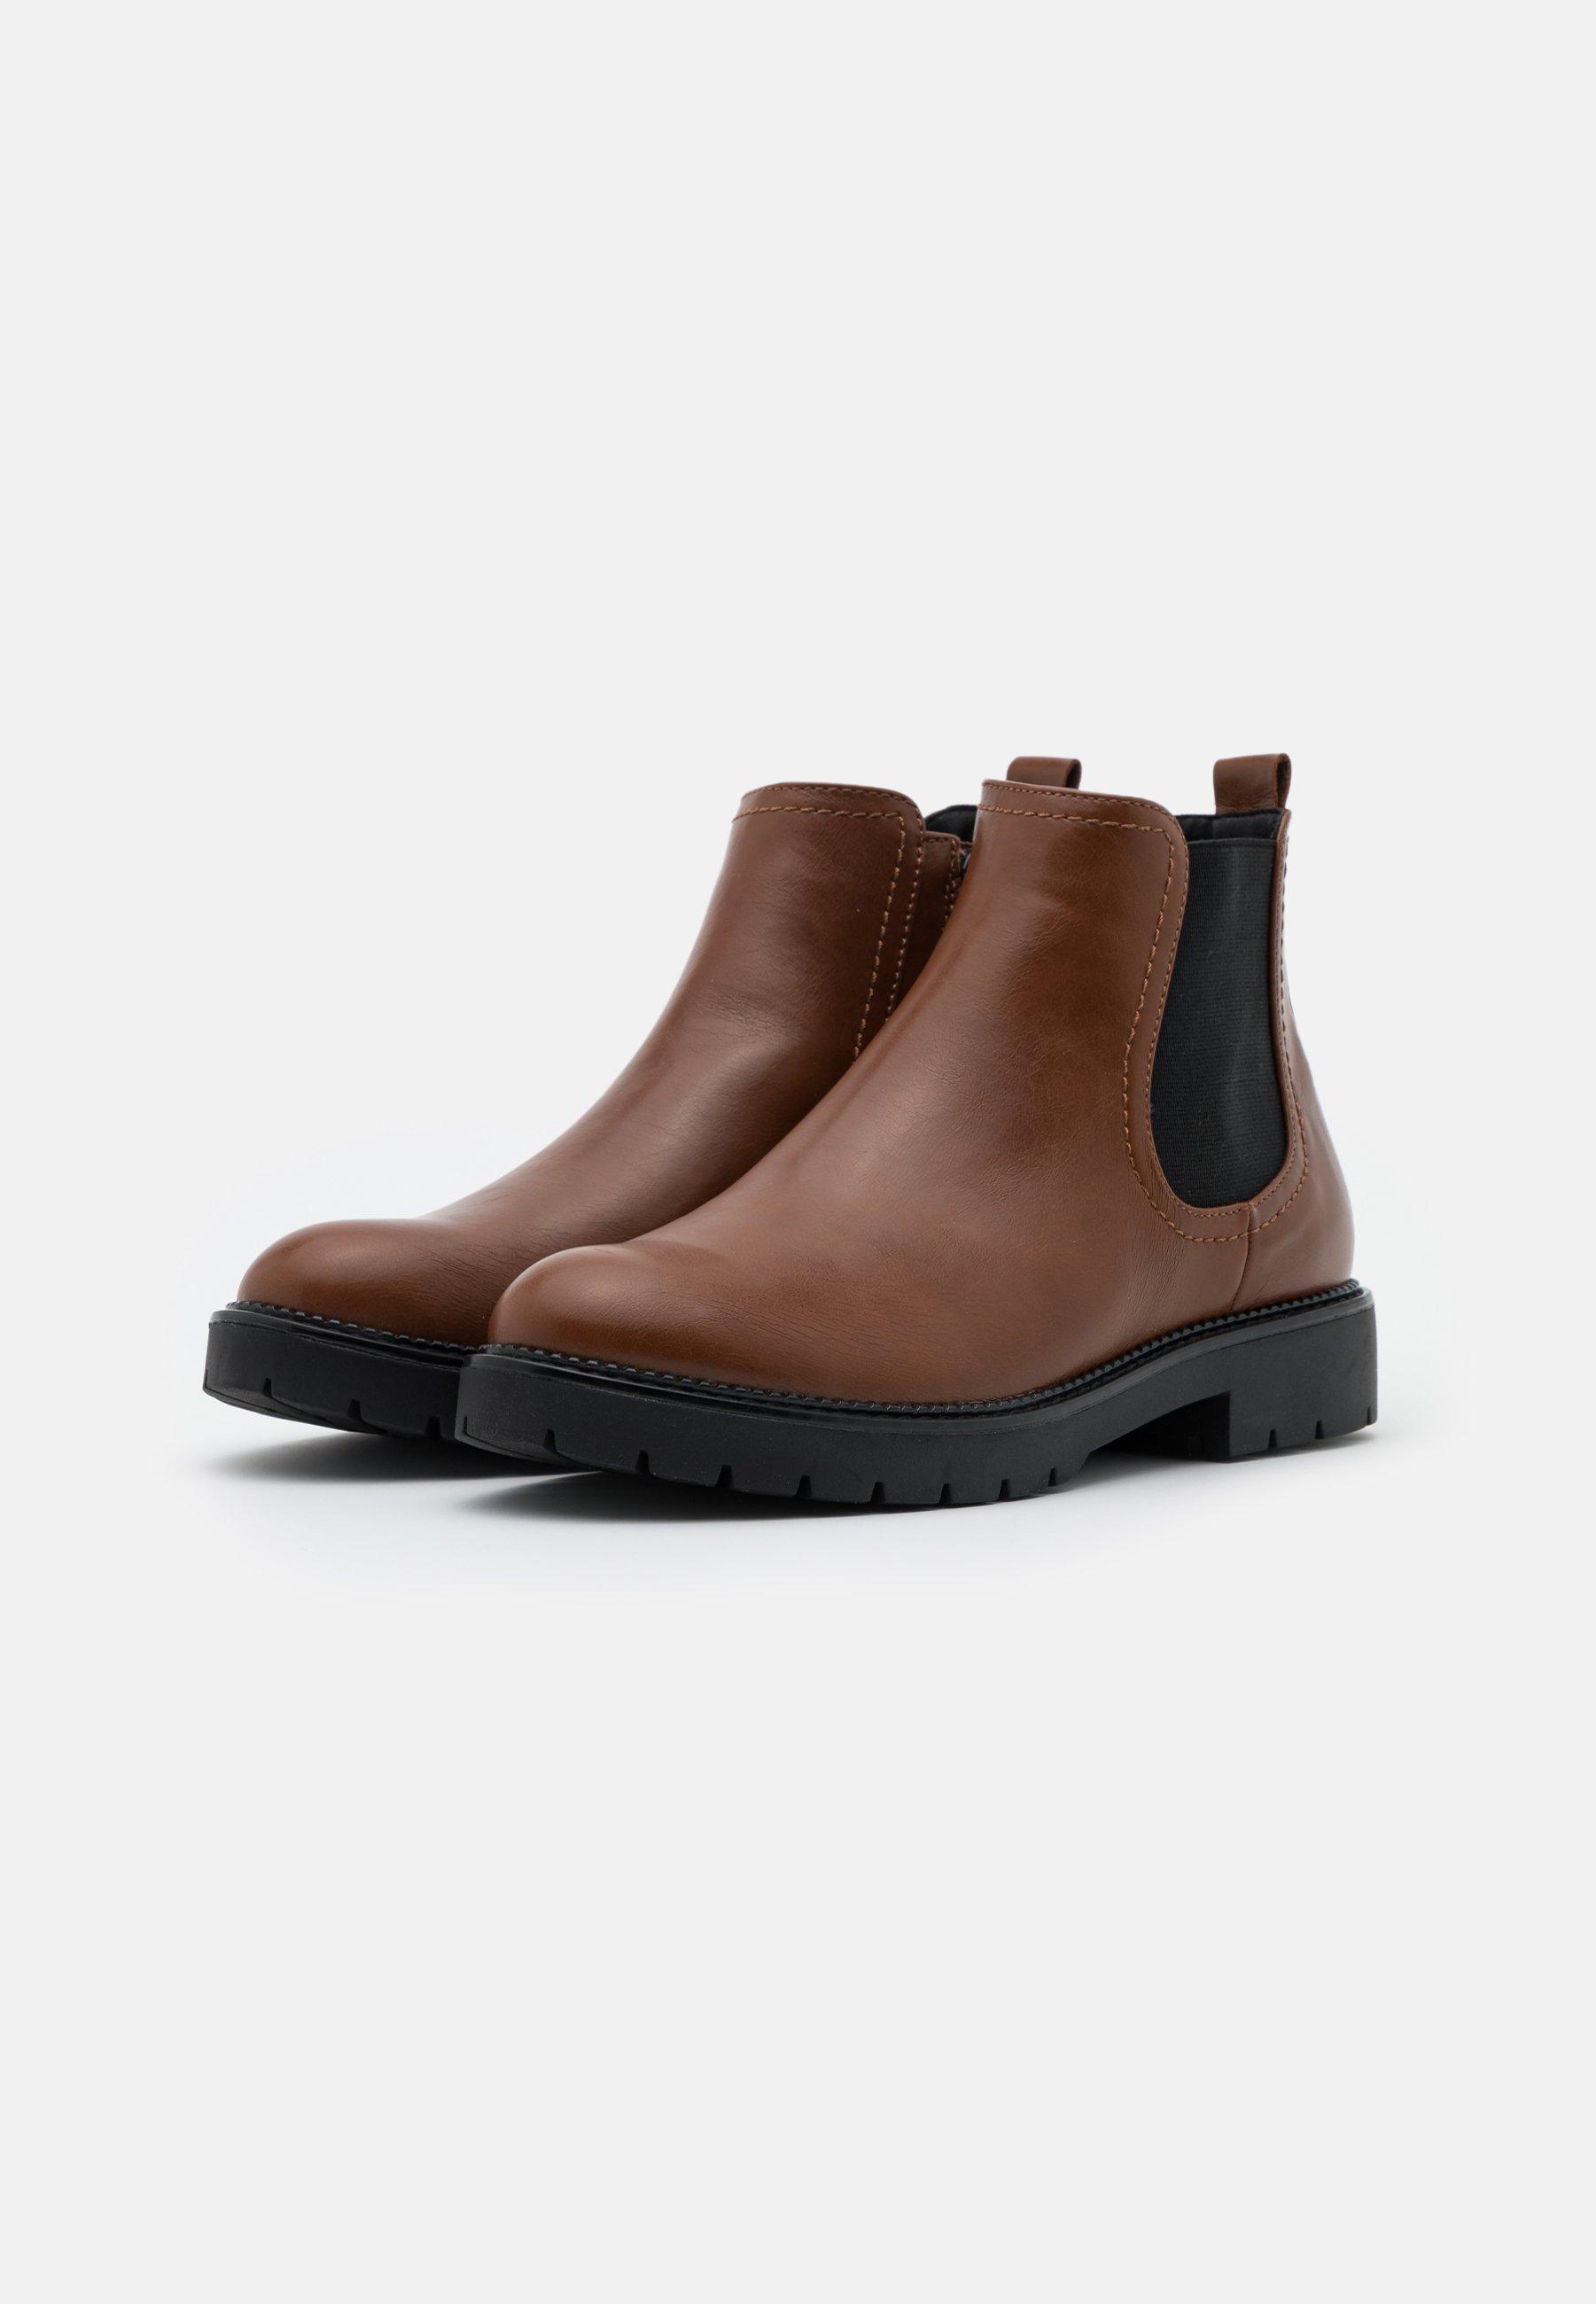 Esprit PALMA  Ankle Boot toffee/cognac